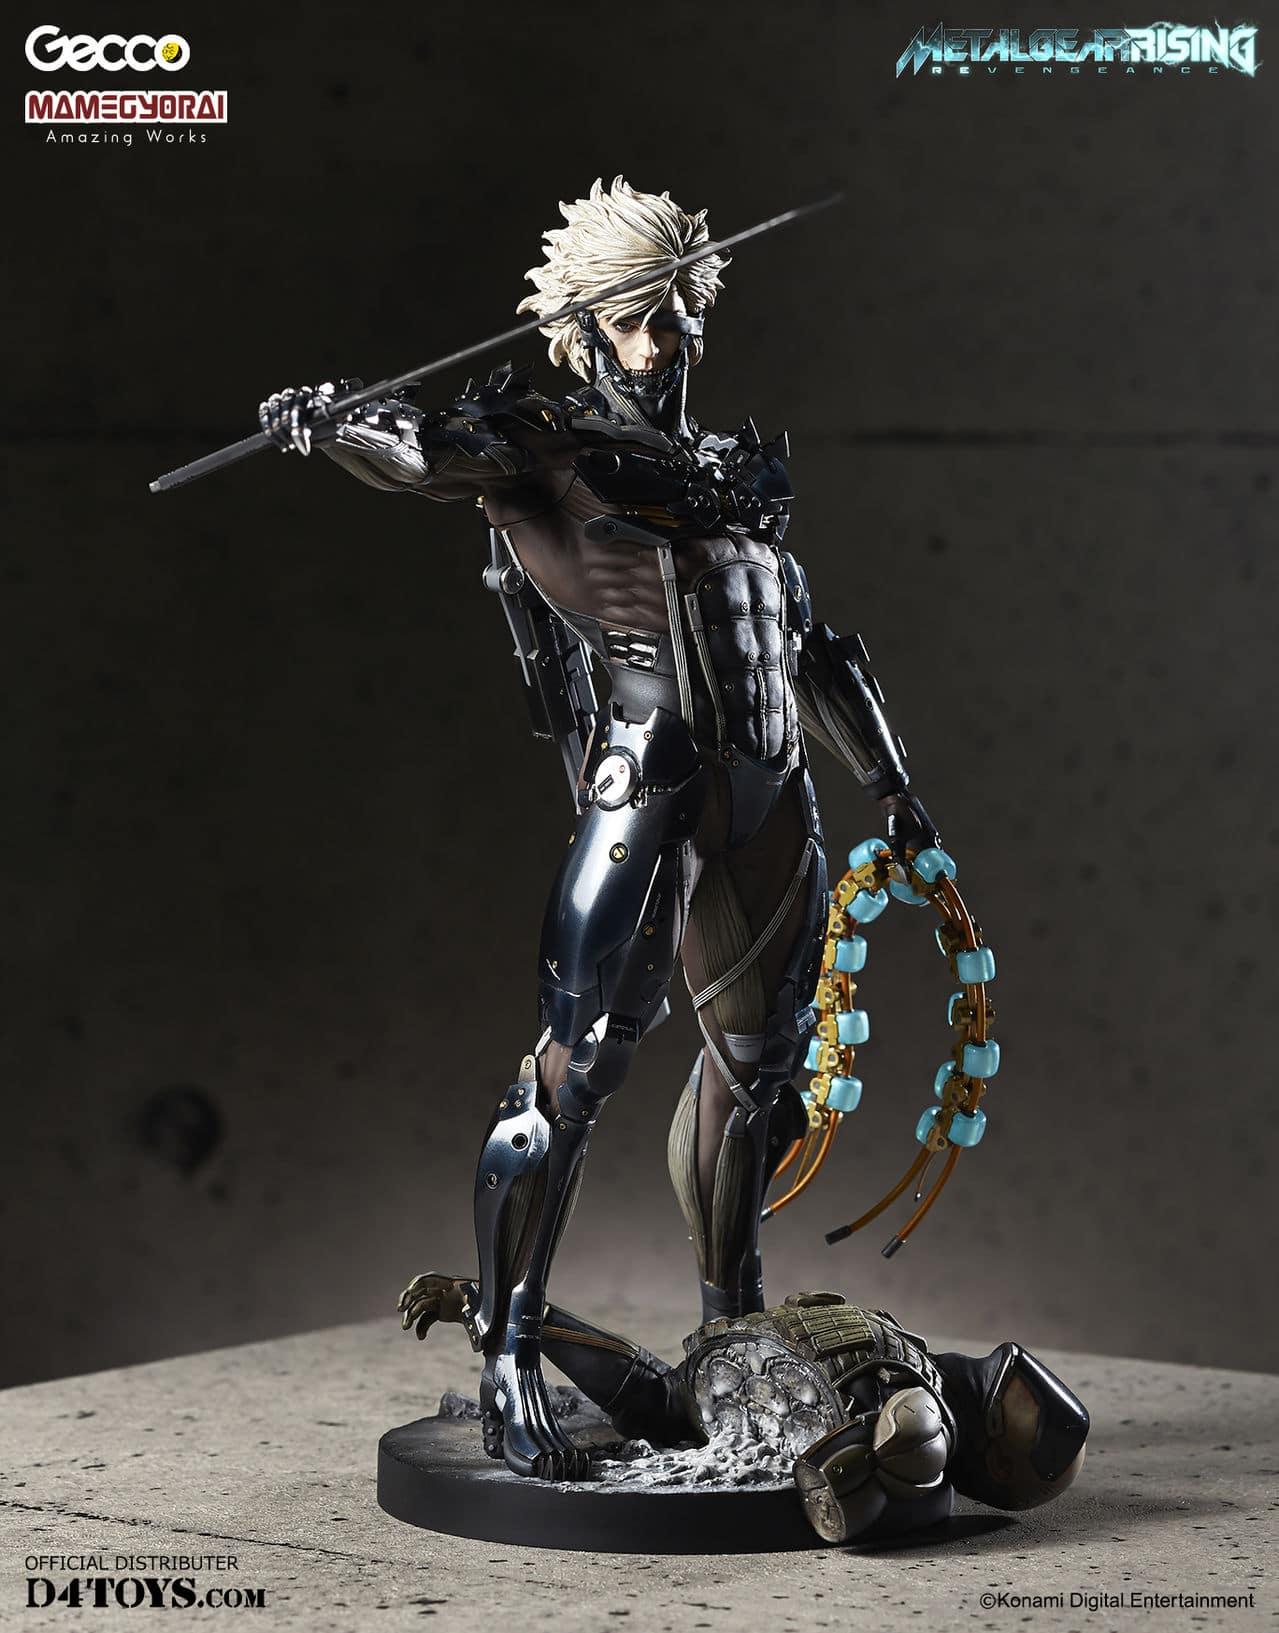 [Gecco,  Mamegyorai] Metal Gear Rising: Revengeance - RAIDEN White Armor 1/6 - SDCC2015 Exclusive - Página 2 D4_001